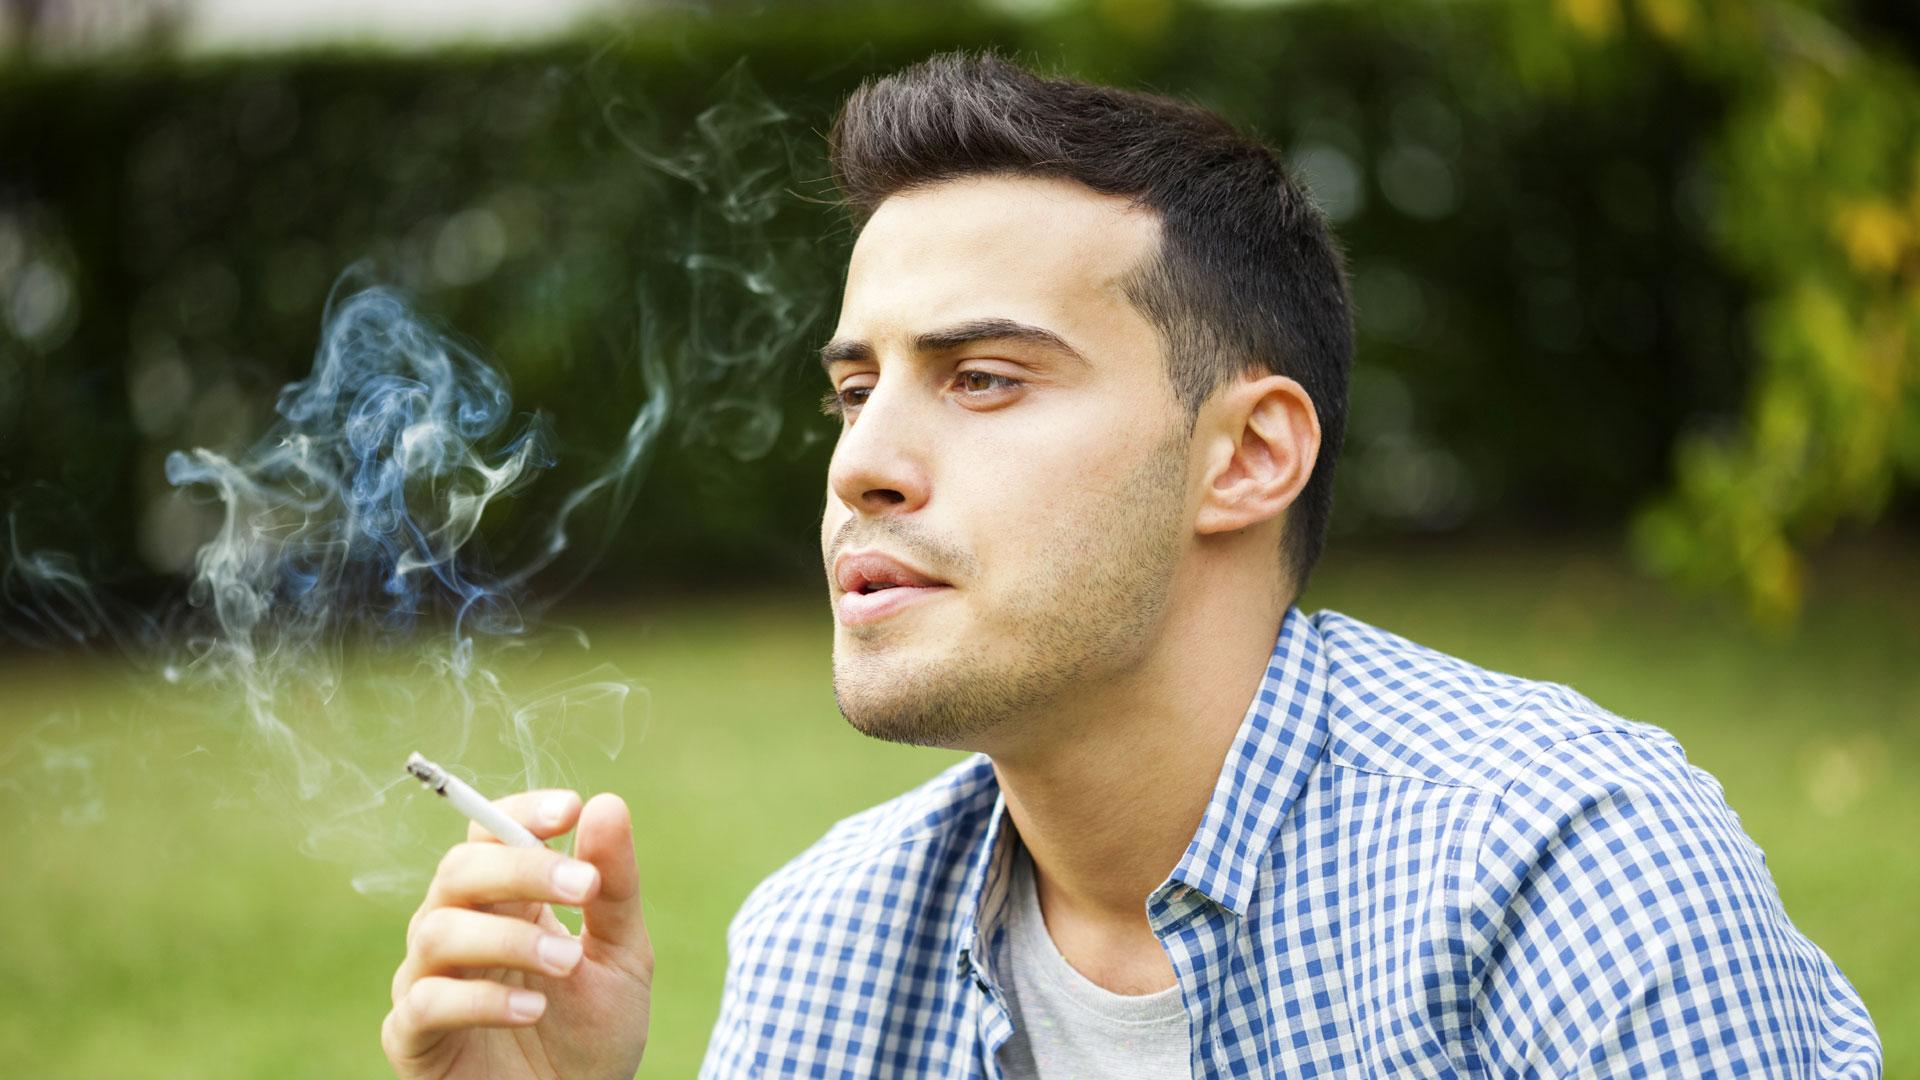 Fumando - 56738 videos - iWank TV